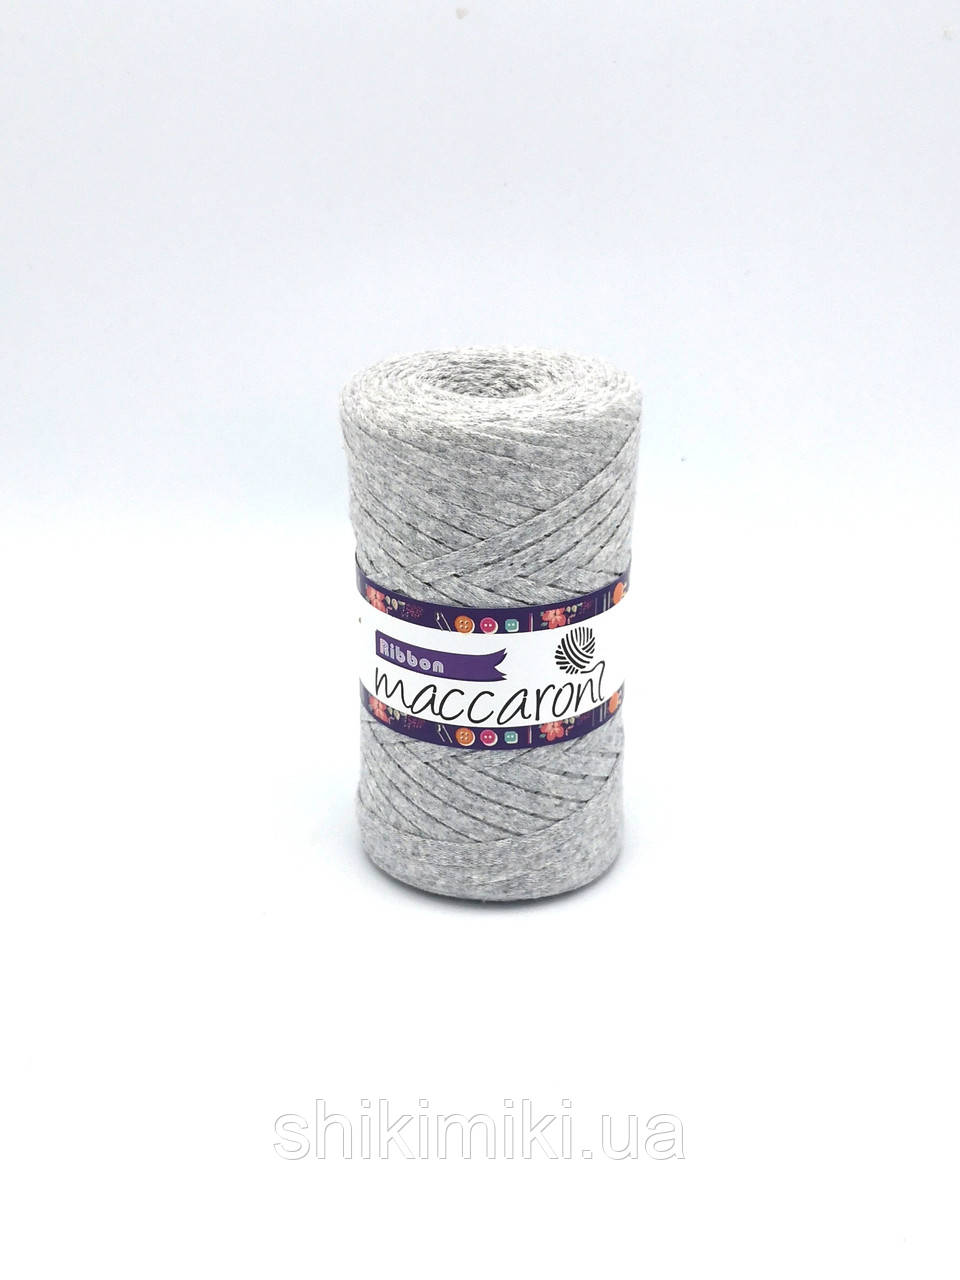 Трикотажный плоский шнур Ribbon, цвет Светло-серый